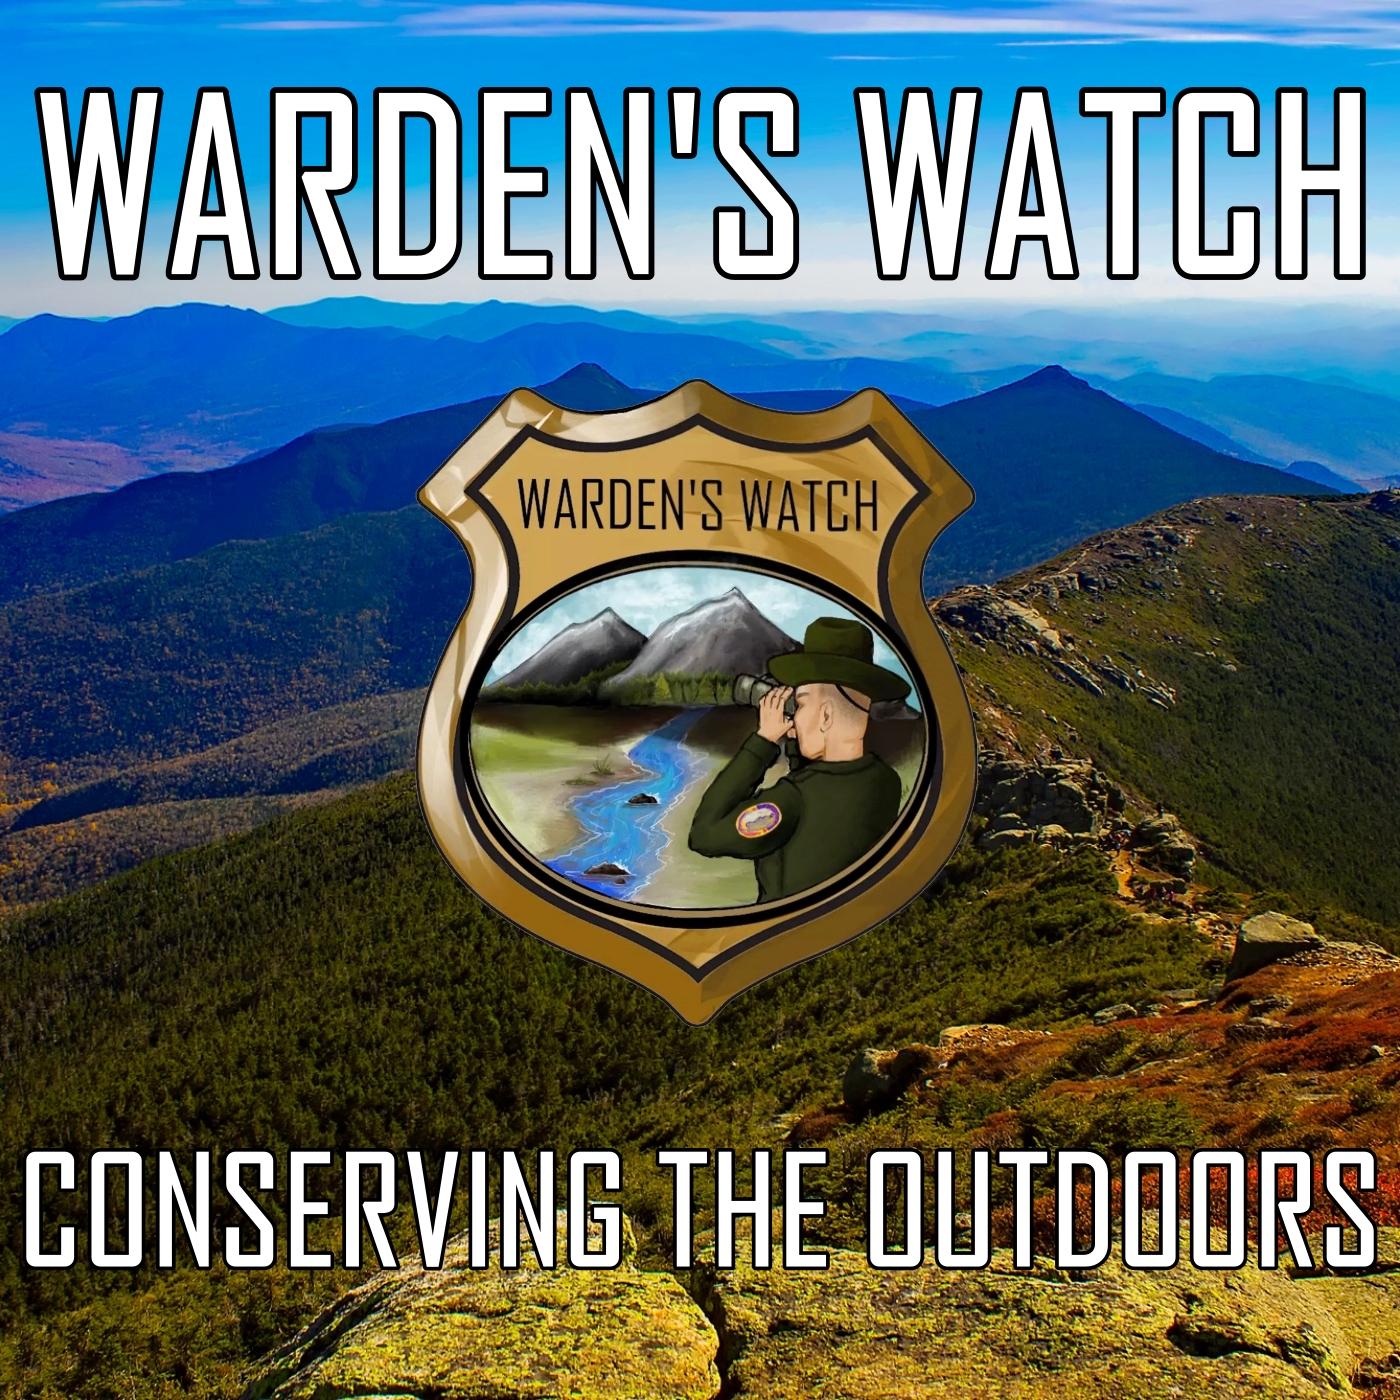 Warden's Watch show art